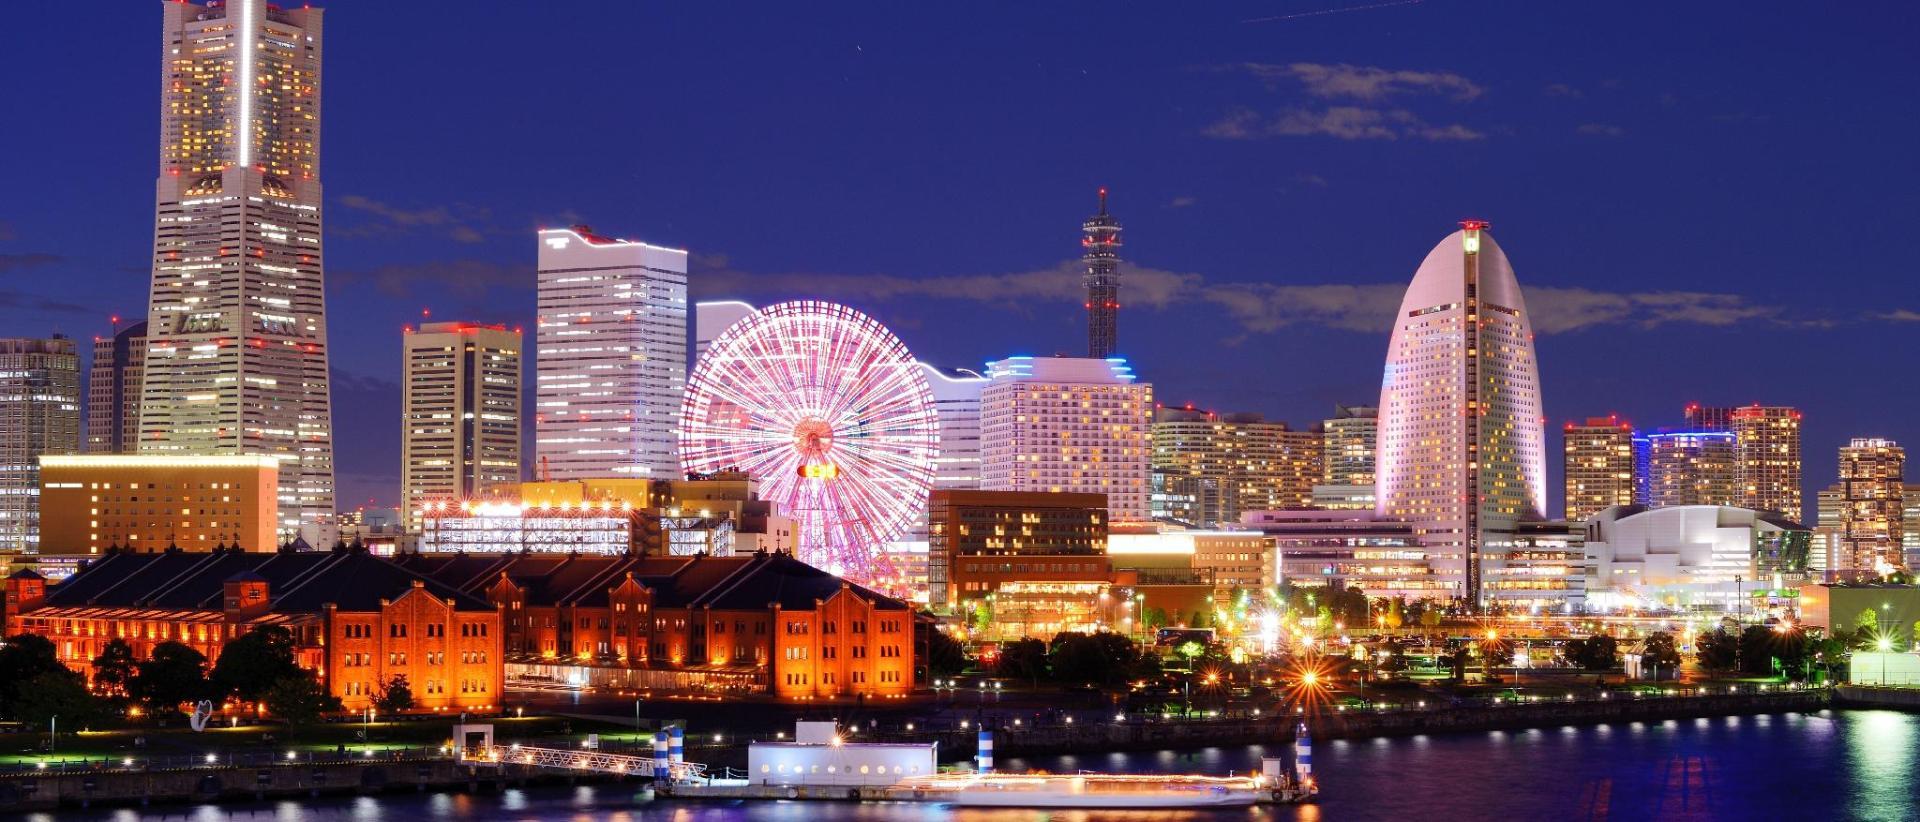 Hotels near Yokohama Sogo Department Store, Yokohama - BEST HOTEL